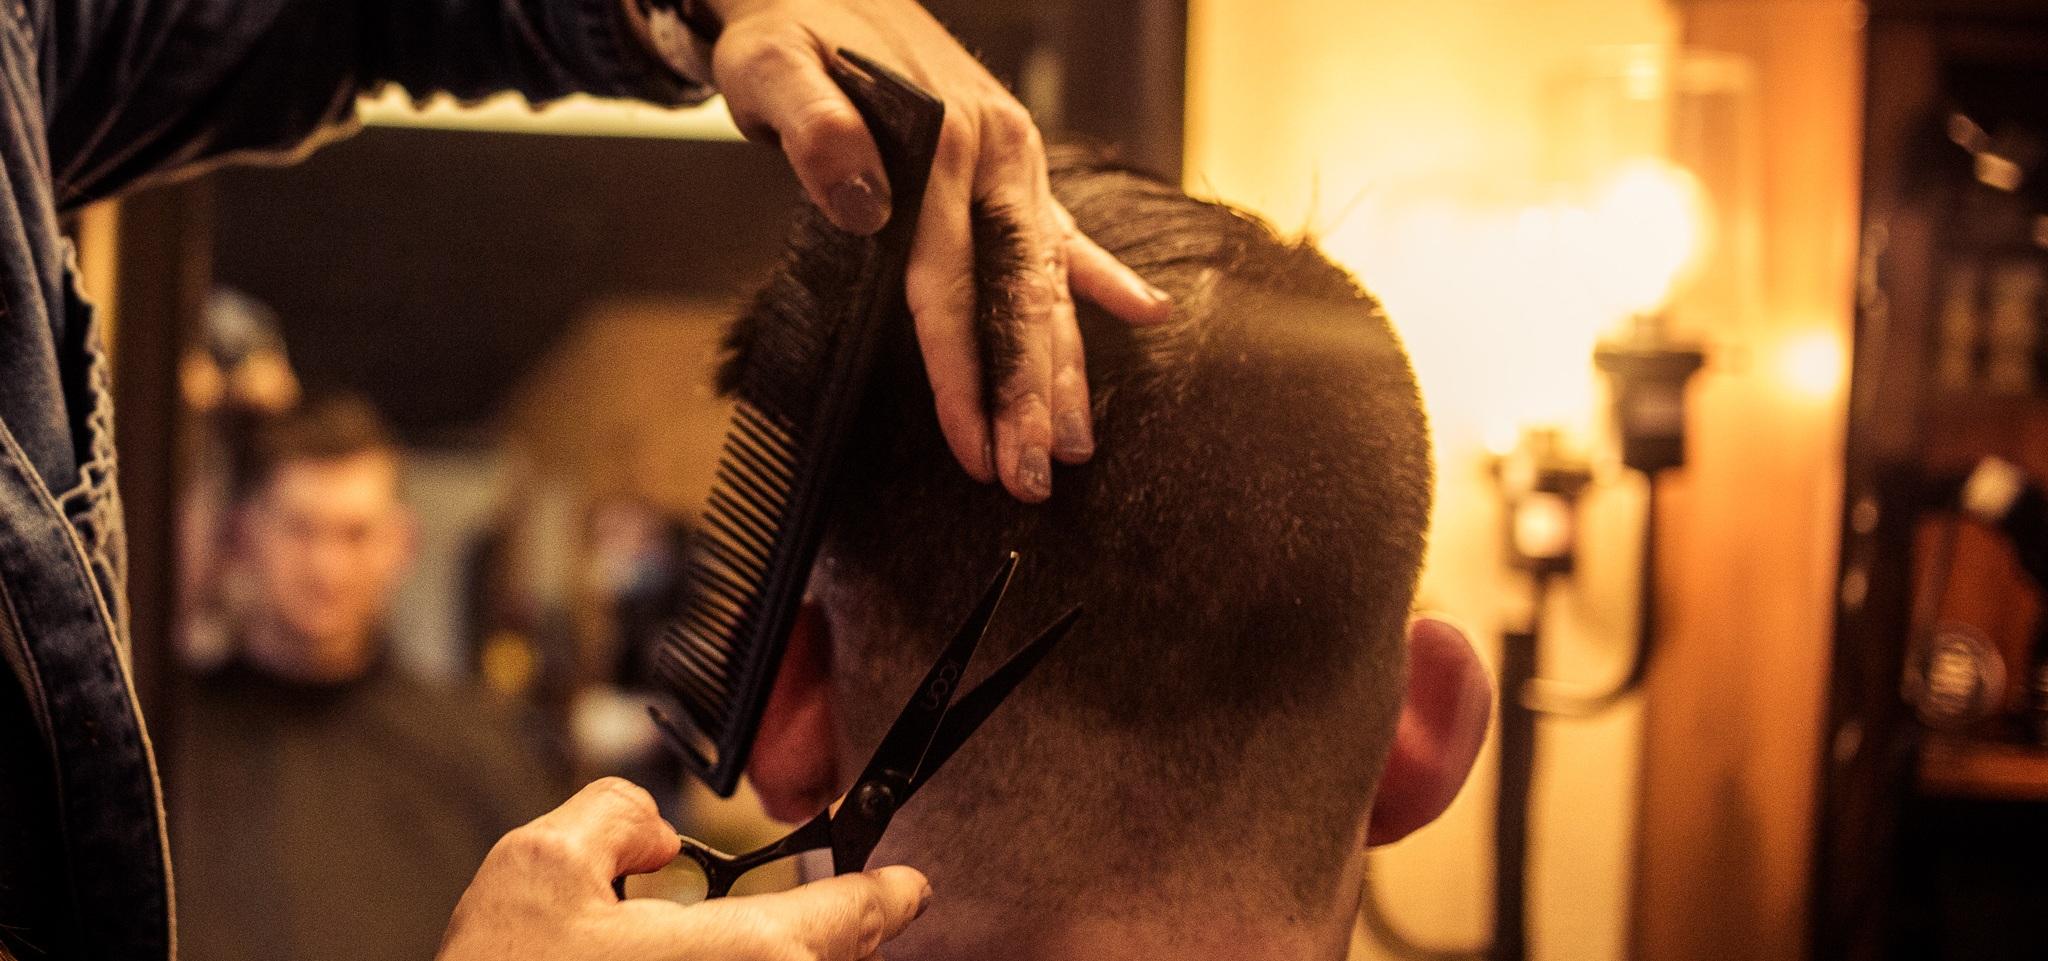 Hair - Fades, contemporary men's hair cuts, and buzz cuts